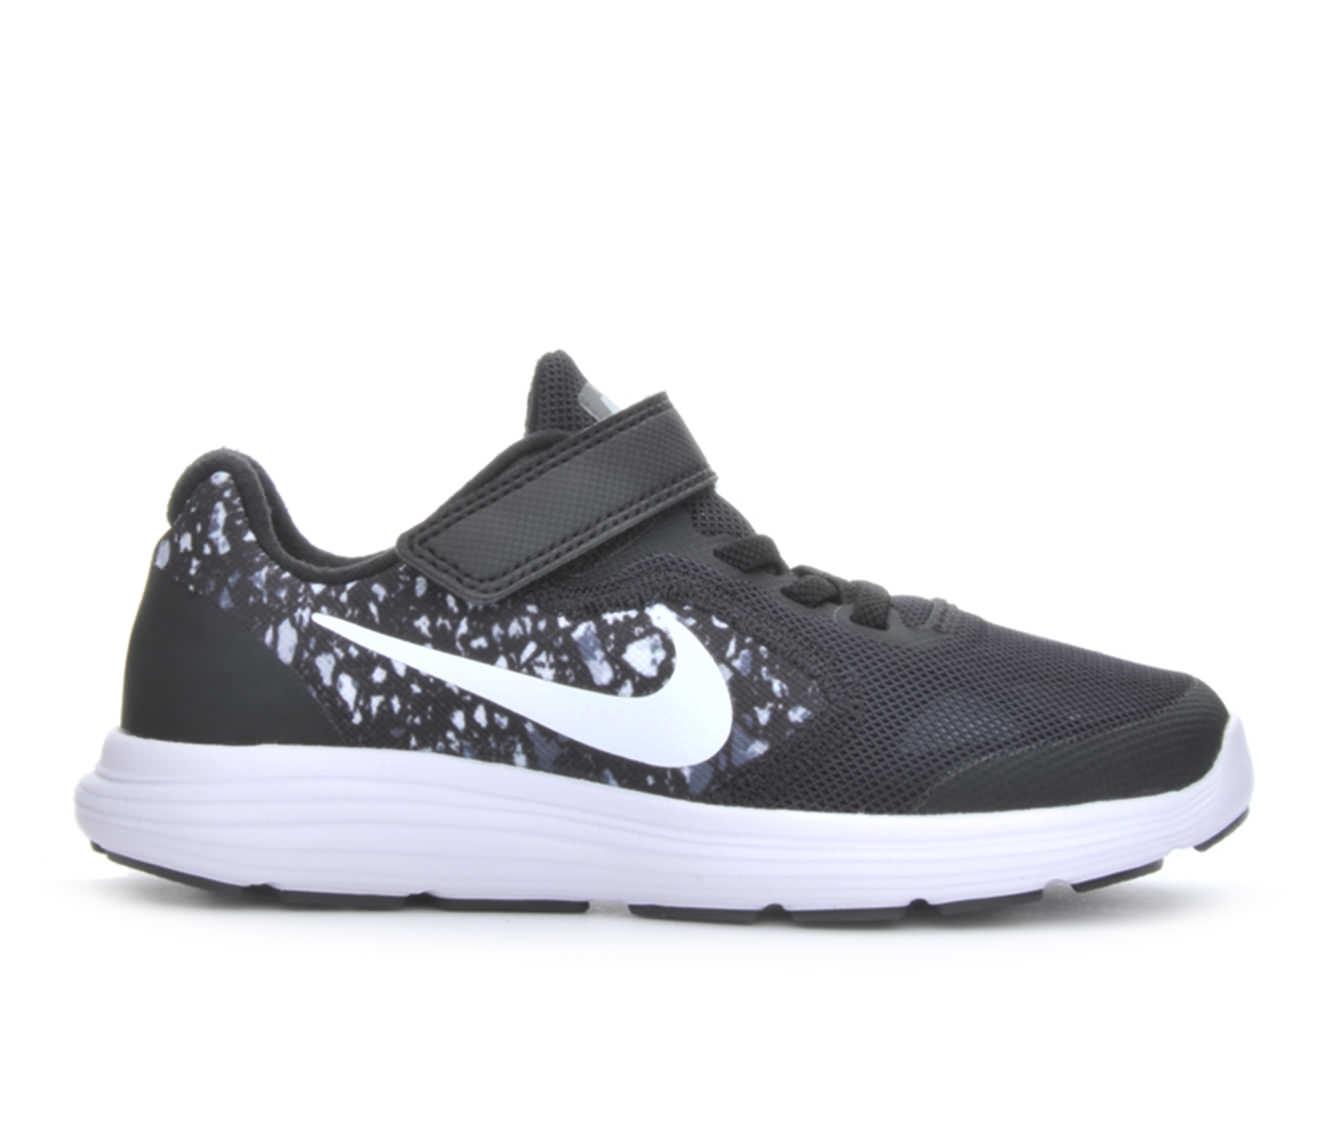 Boys' Nike Revolution 3 Print Running Shoes (Black)